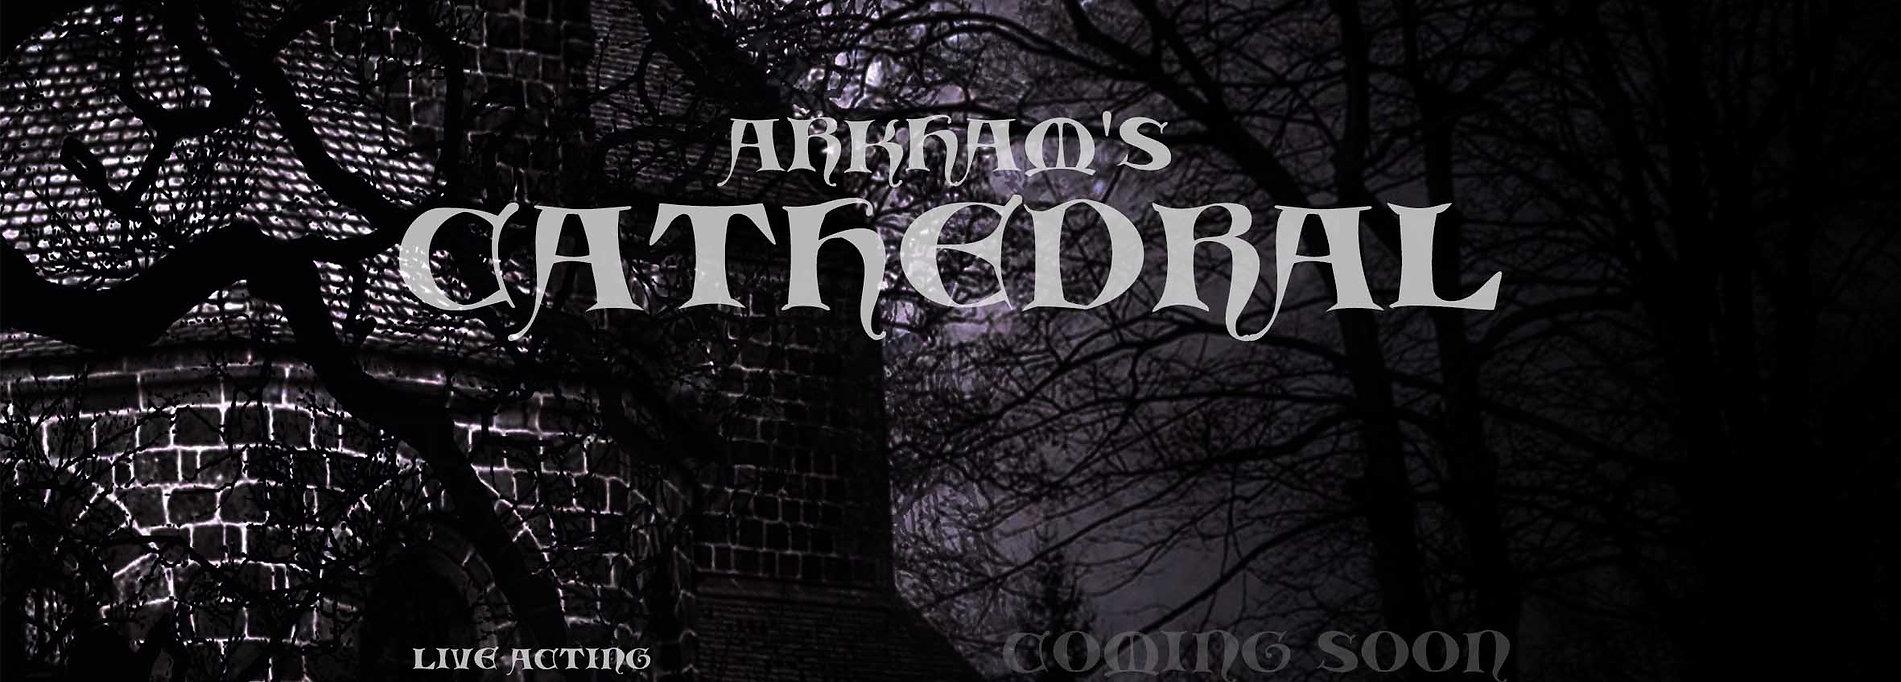 1 cathedral dagon strip horror  - arkham escape room rooms athens greece αθηνα ελλαδα δωματια αποδρασης